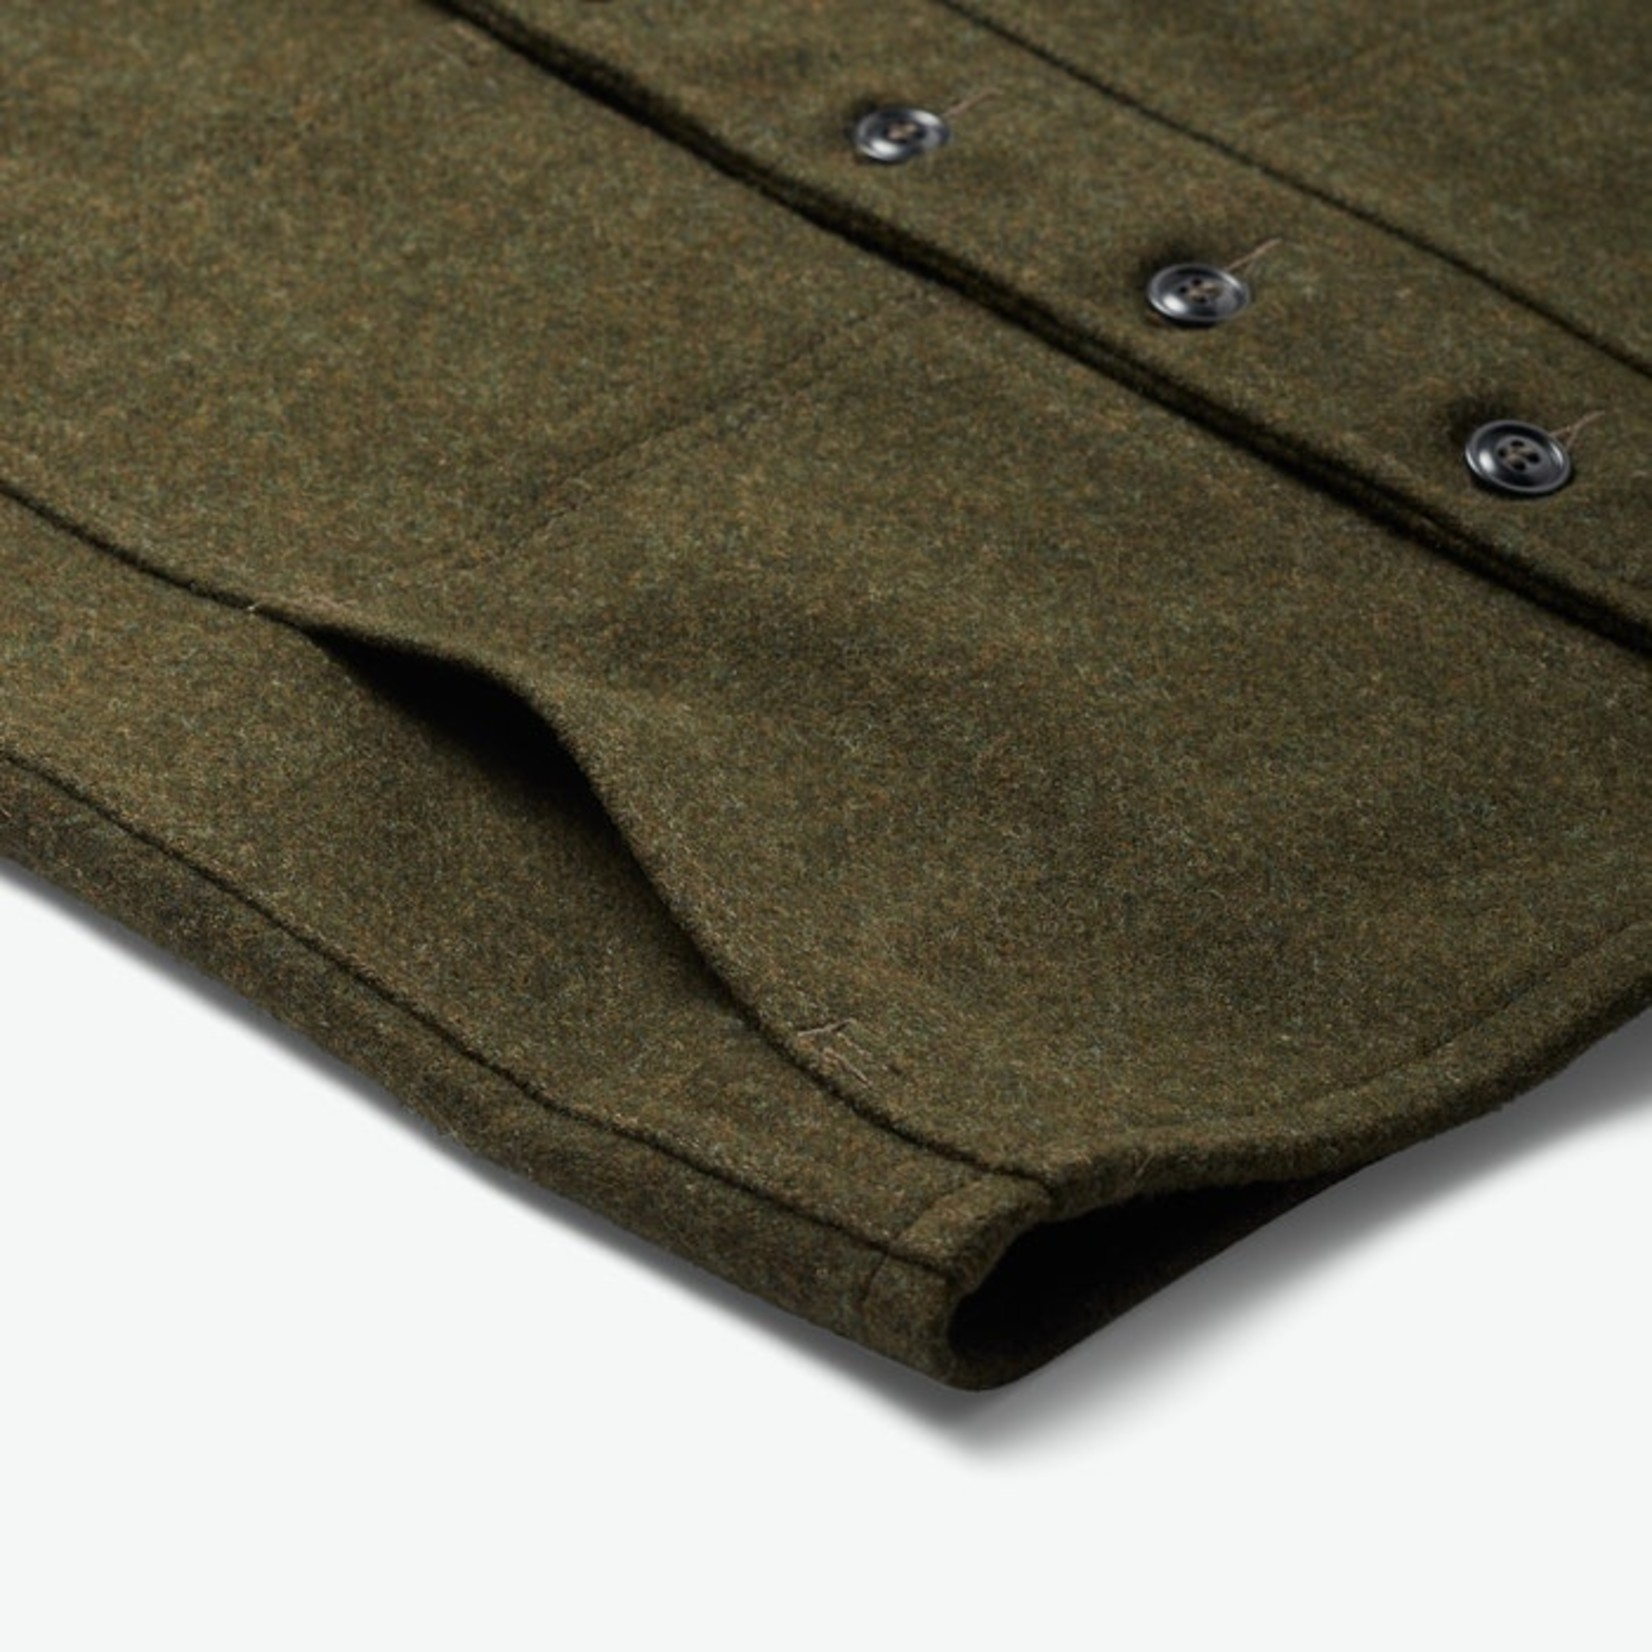 Filson Filson 11010055 Mackinaw Wool Vest- Forest Green